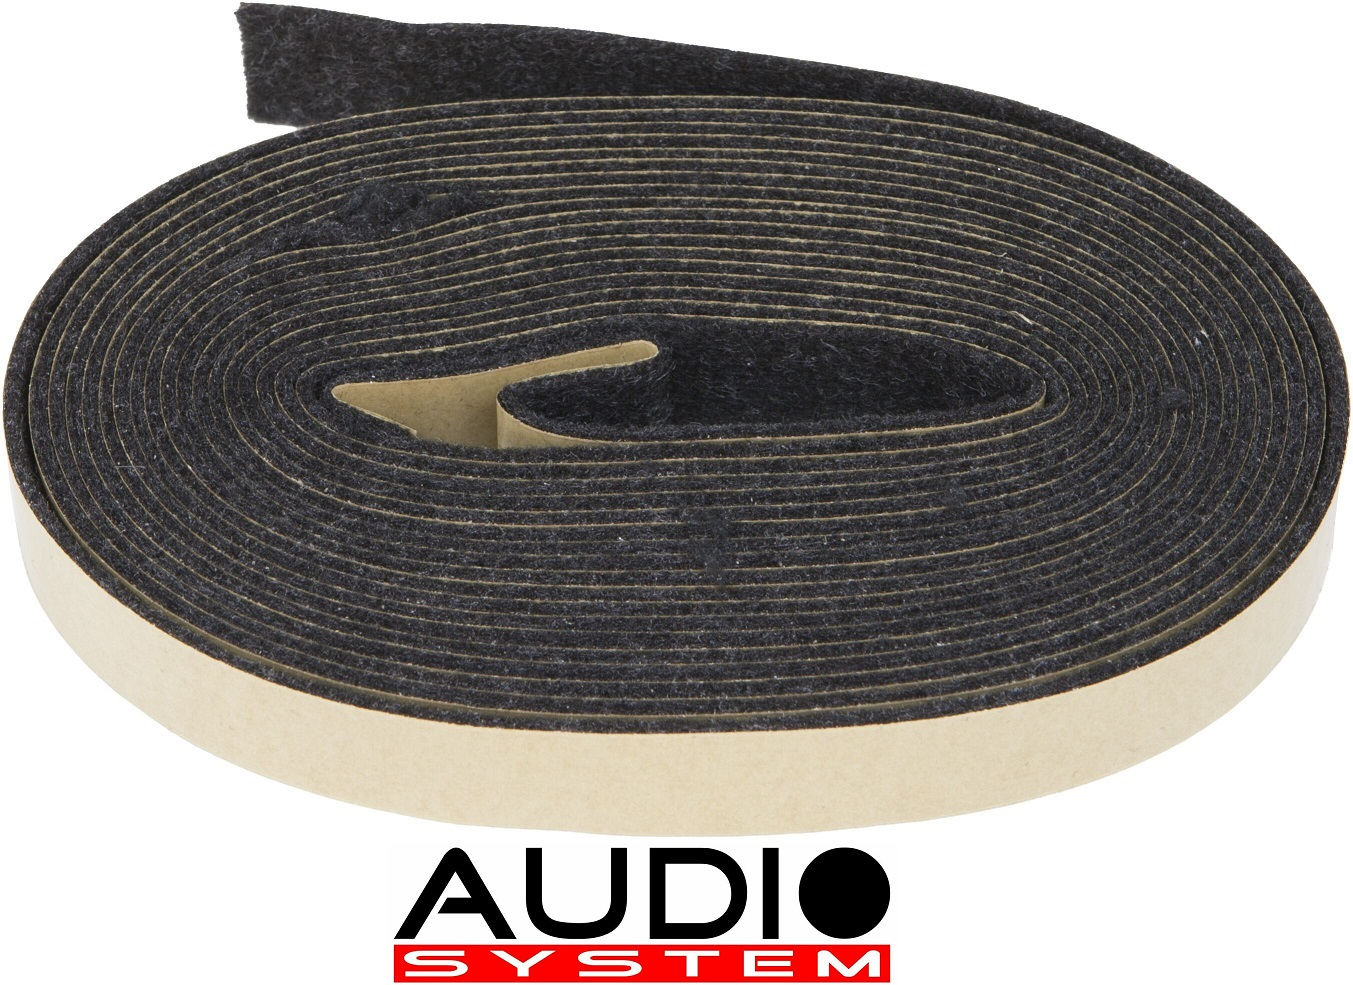 AUDIO SYSTEM SILENCE TAPE Dämm-KLebeband  6 m x 20 mm Dämmaterial MADE in EU